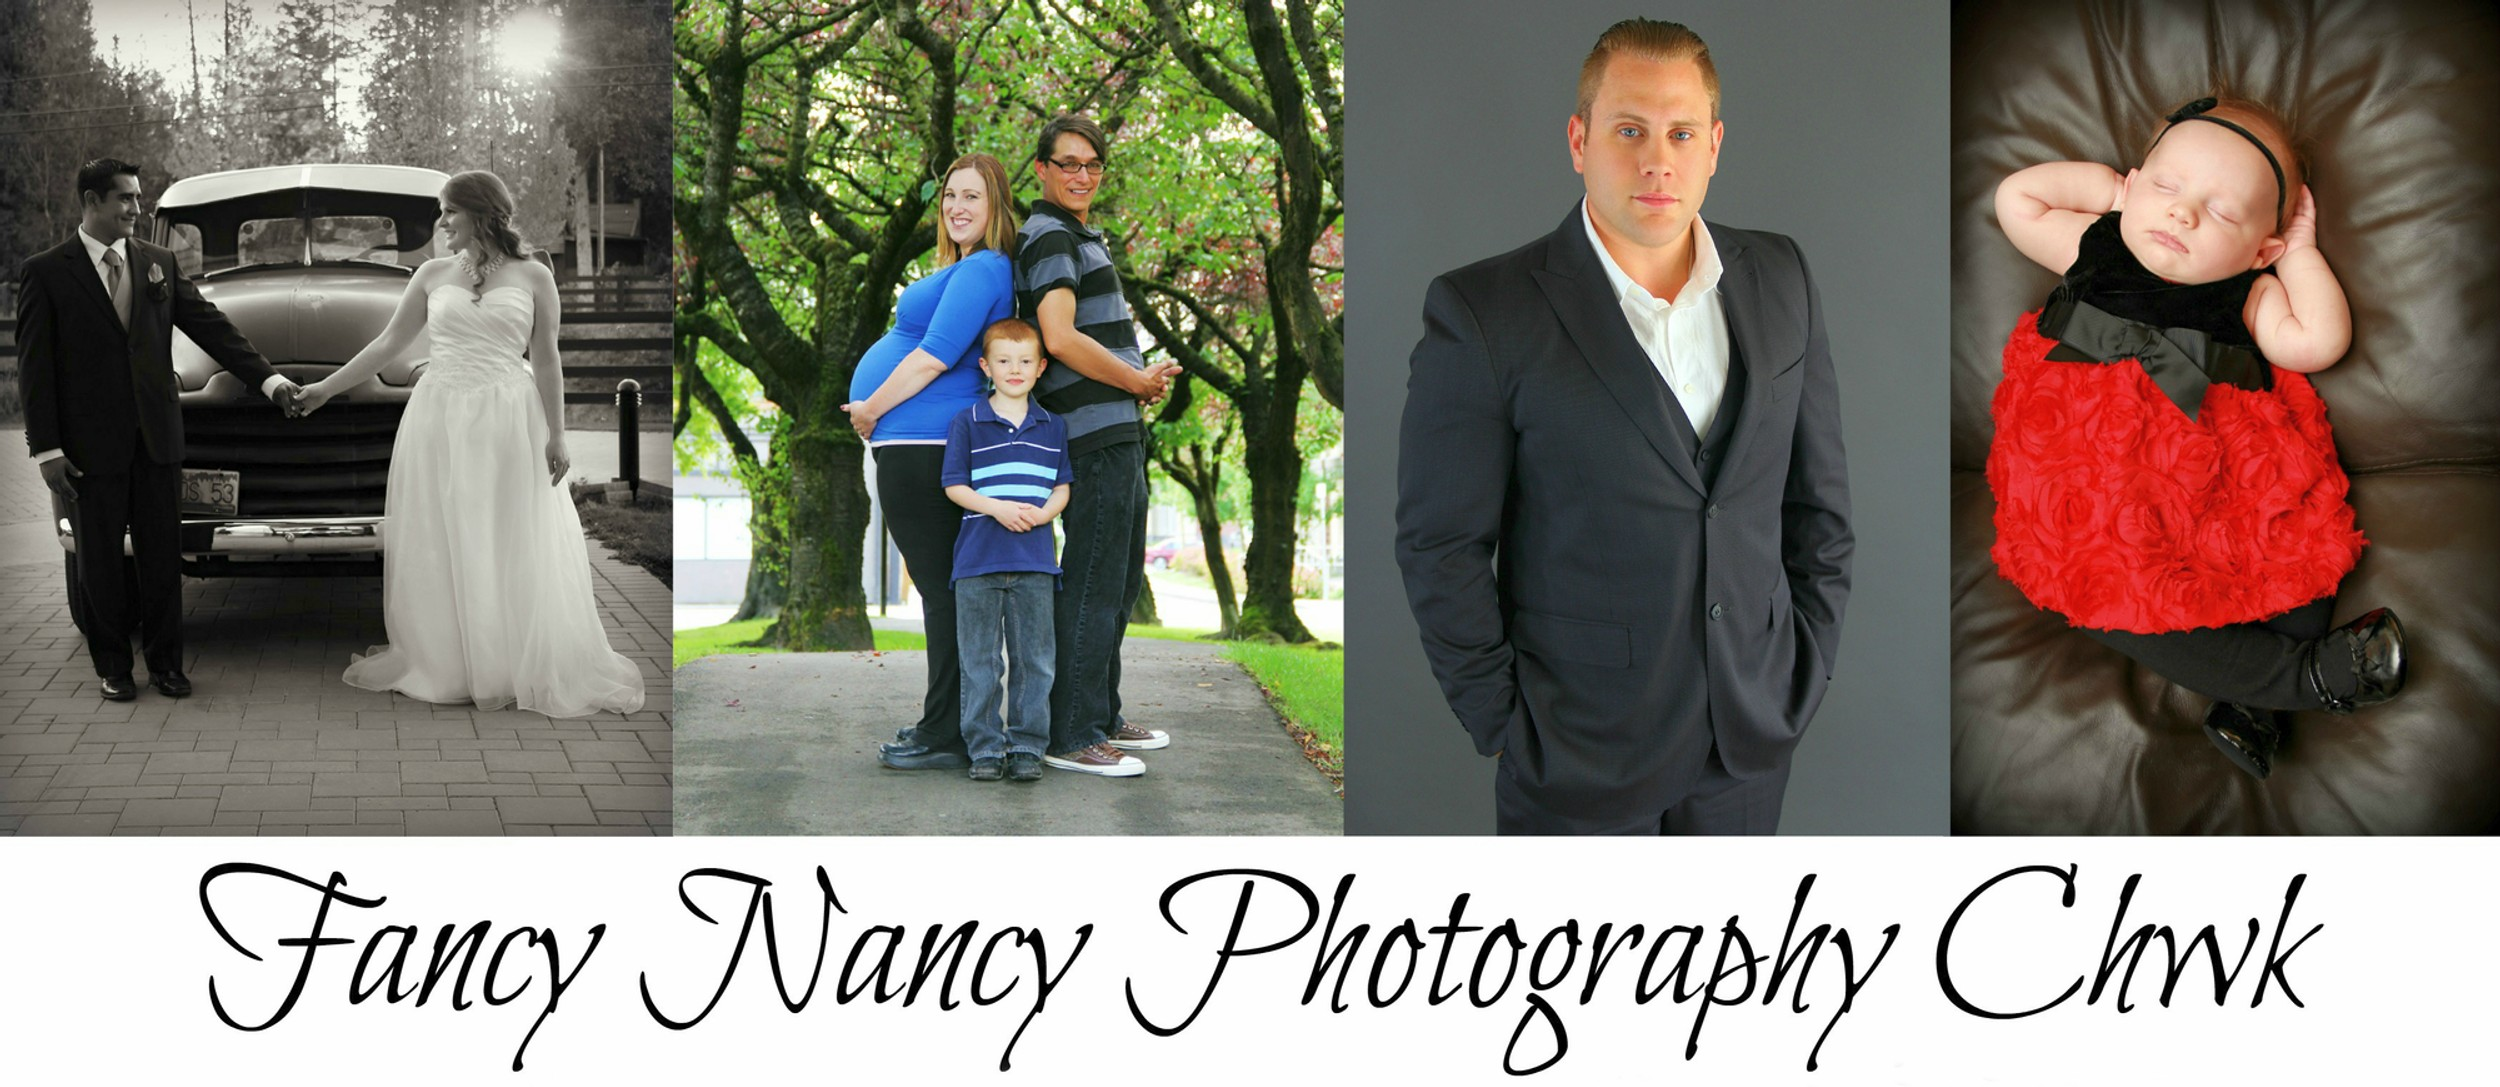 Fancy Nancy Photography Chwk logo